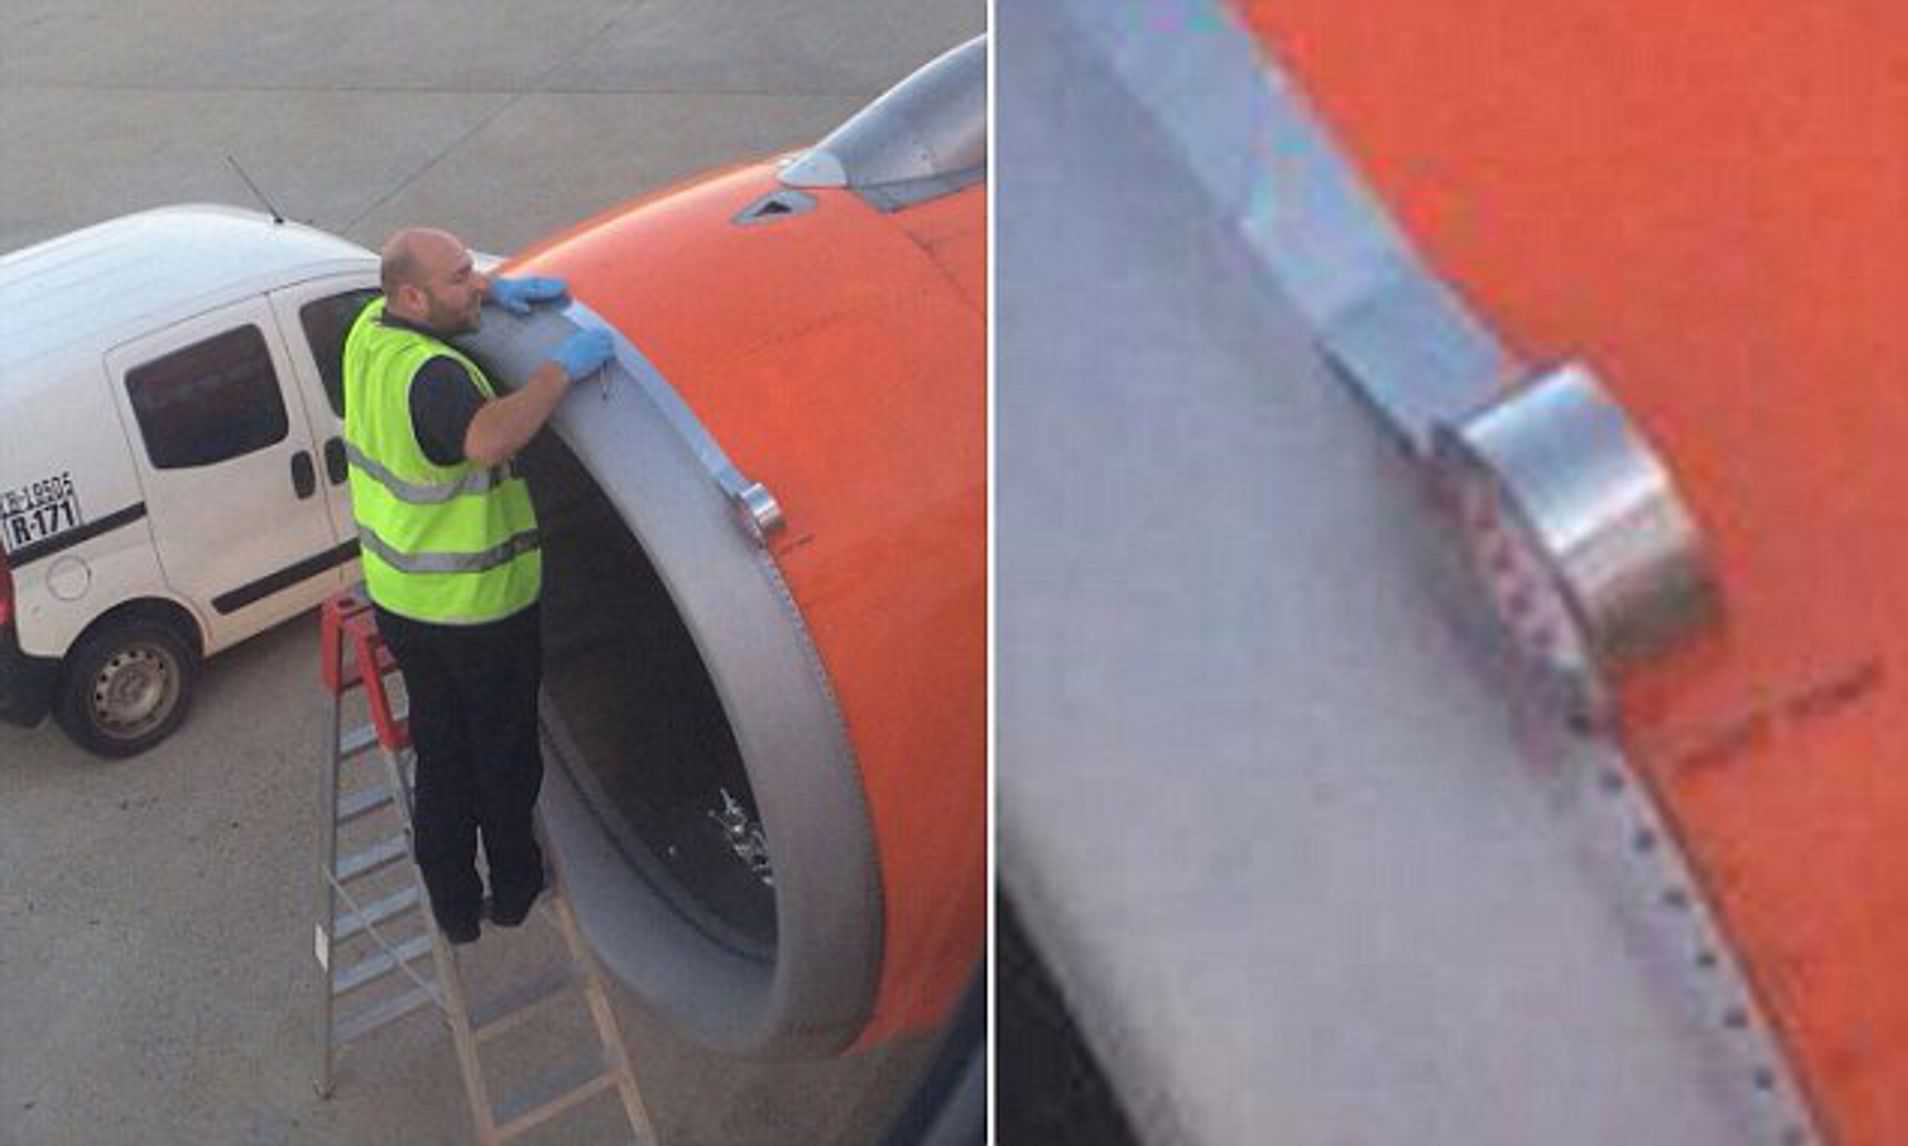 Easyjet Passenger Takes Photo Of Worker Using Tape On Plane Engine